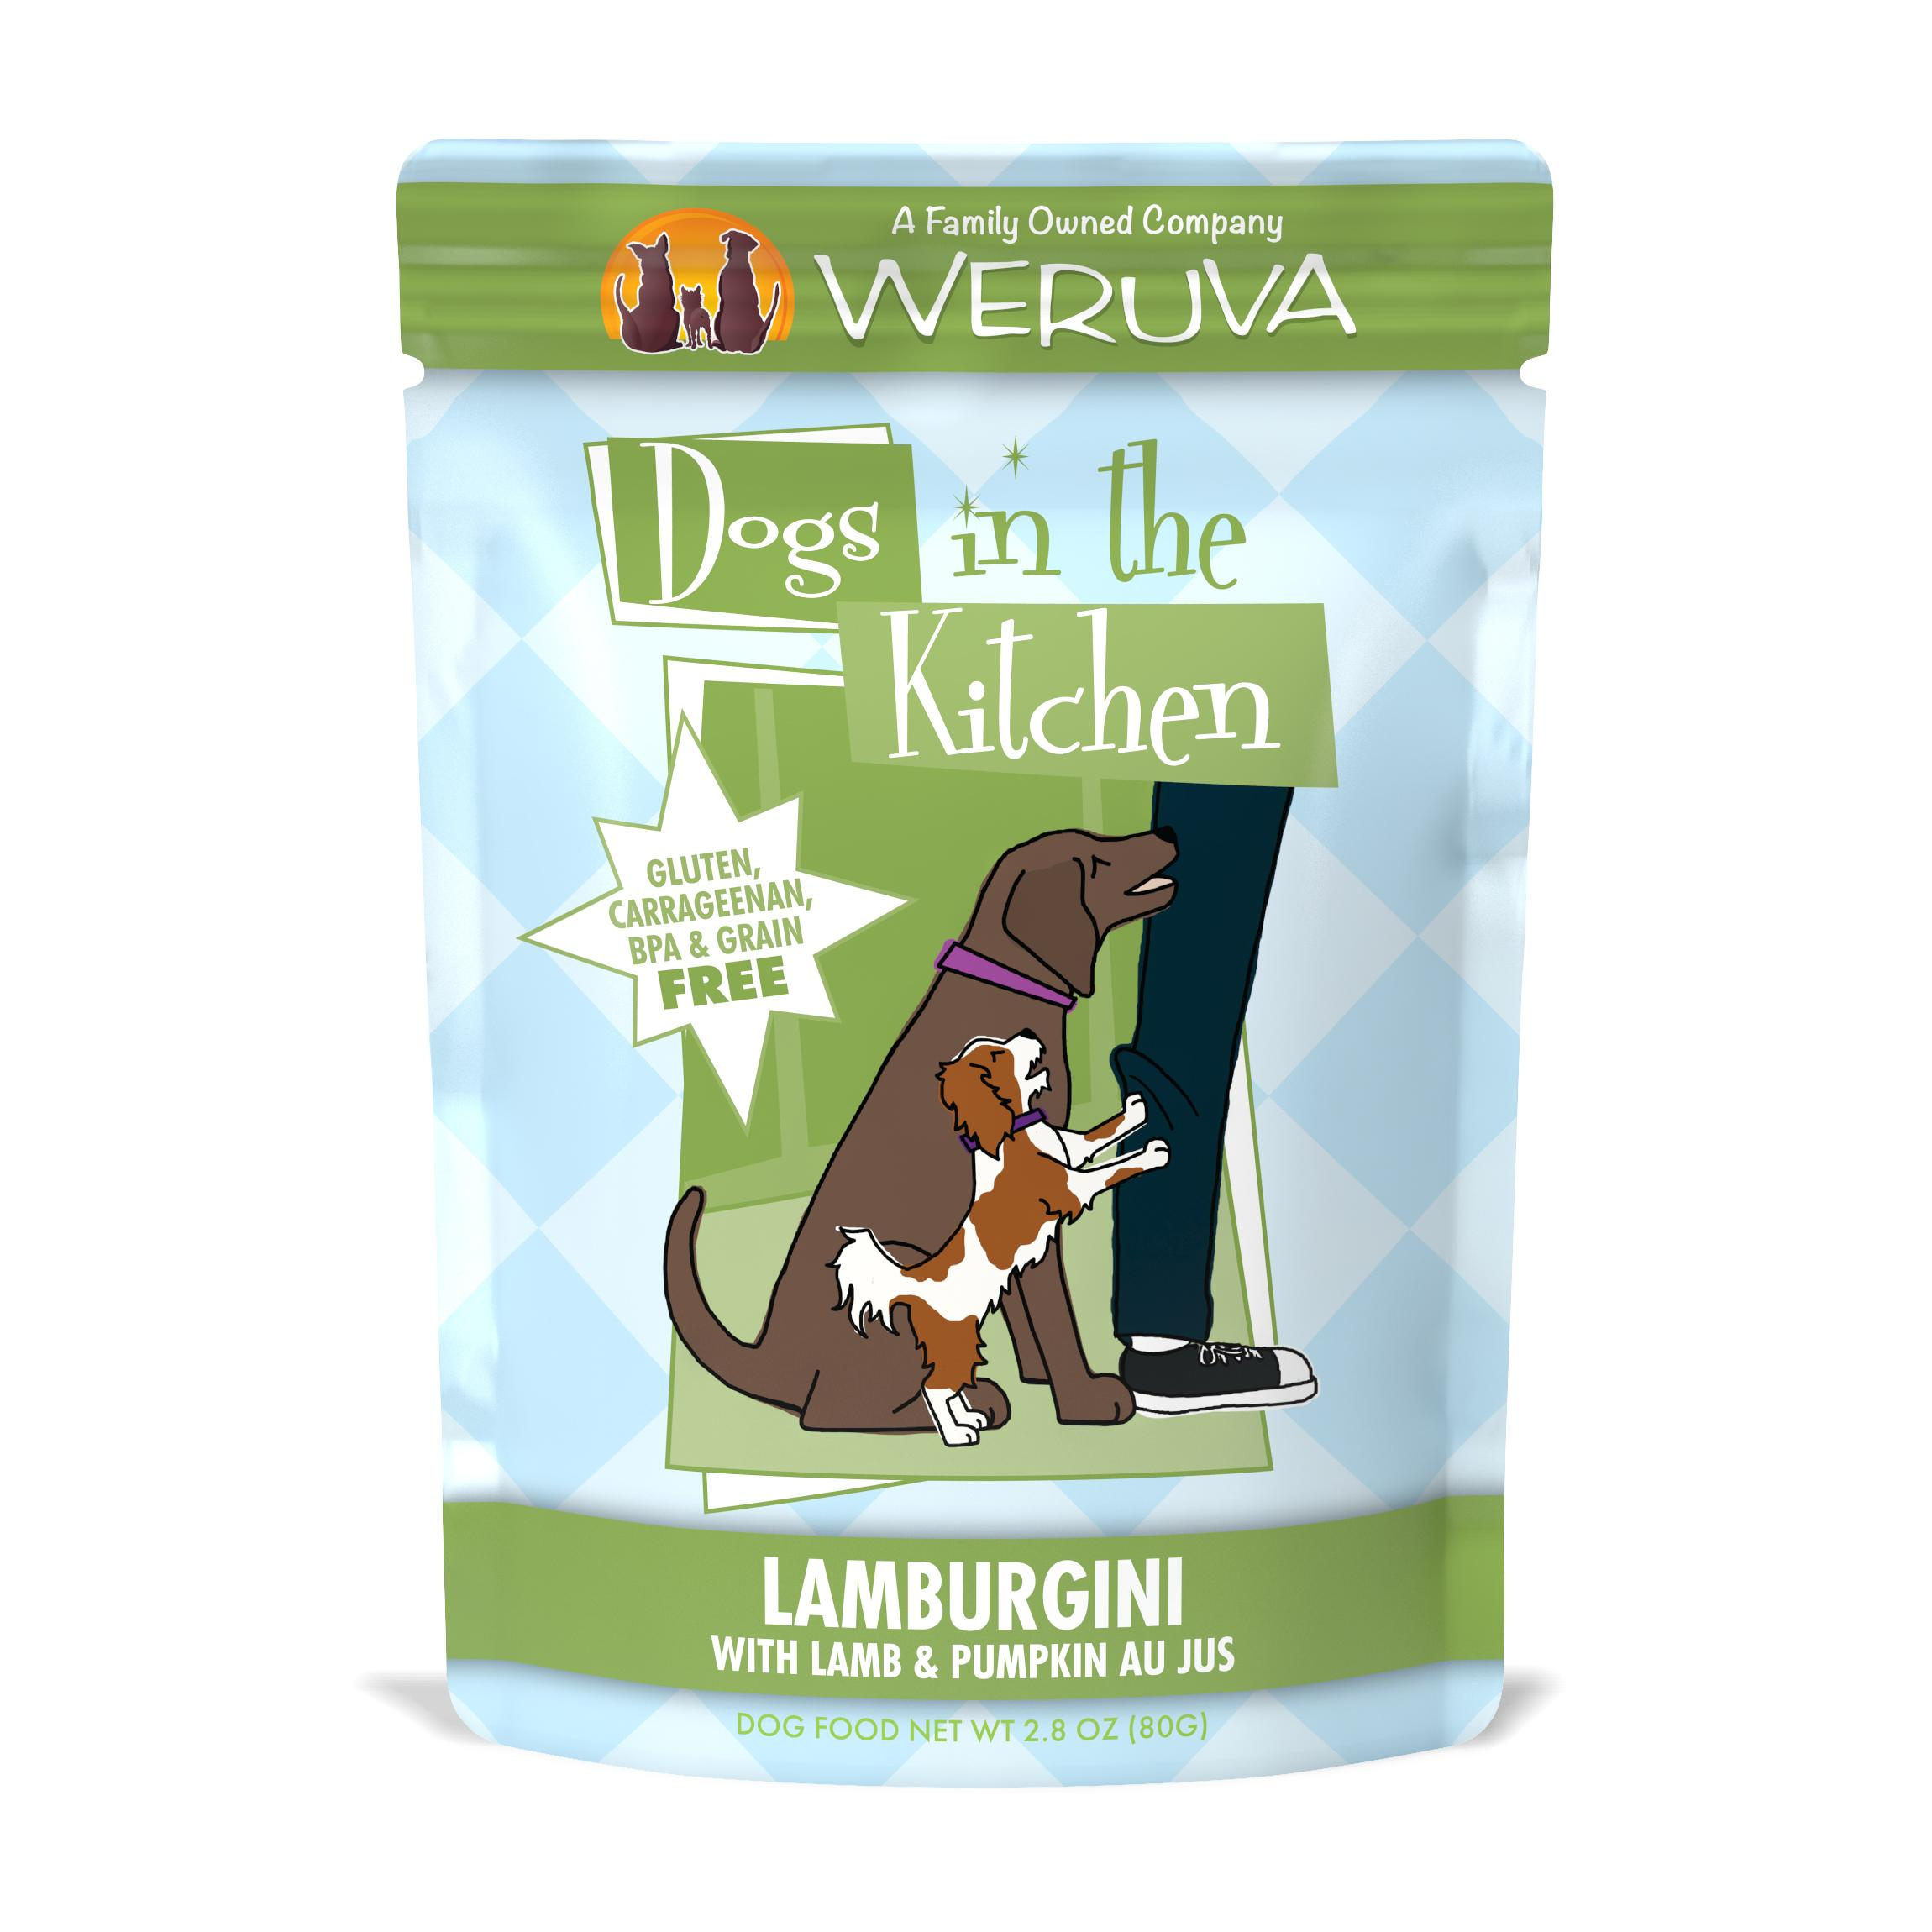 Weruva Dogs in the Kitchen Lamburgini with Lamb & Pumpkin Au Jus Grain-Free Wet Dog Food, 2.8-oz